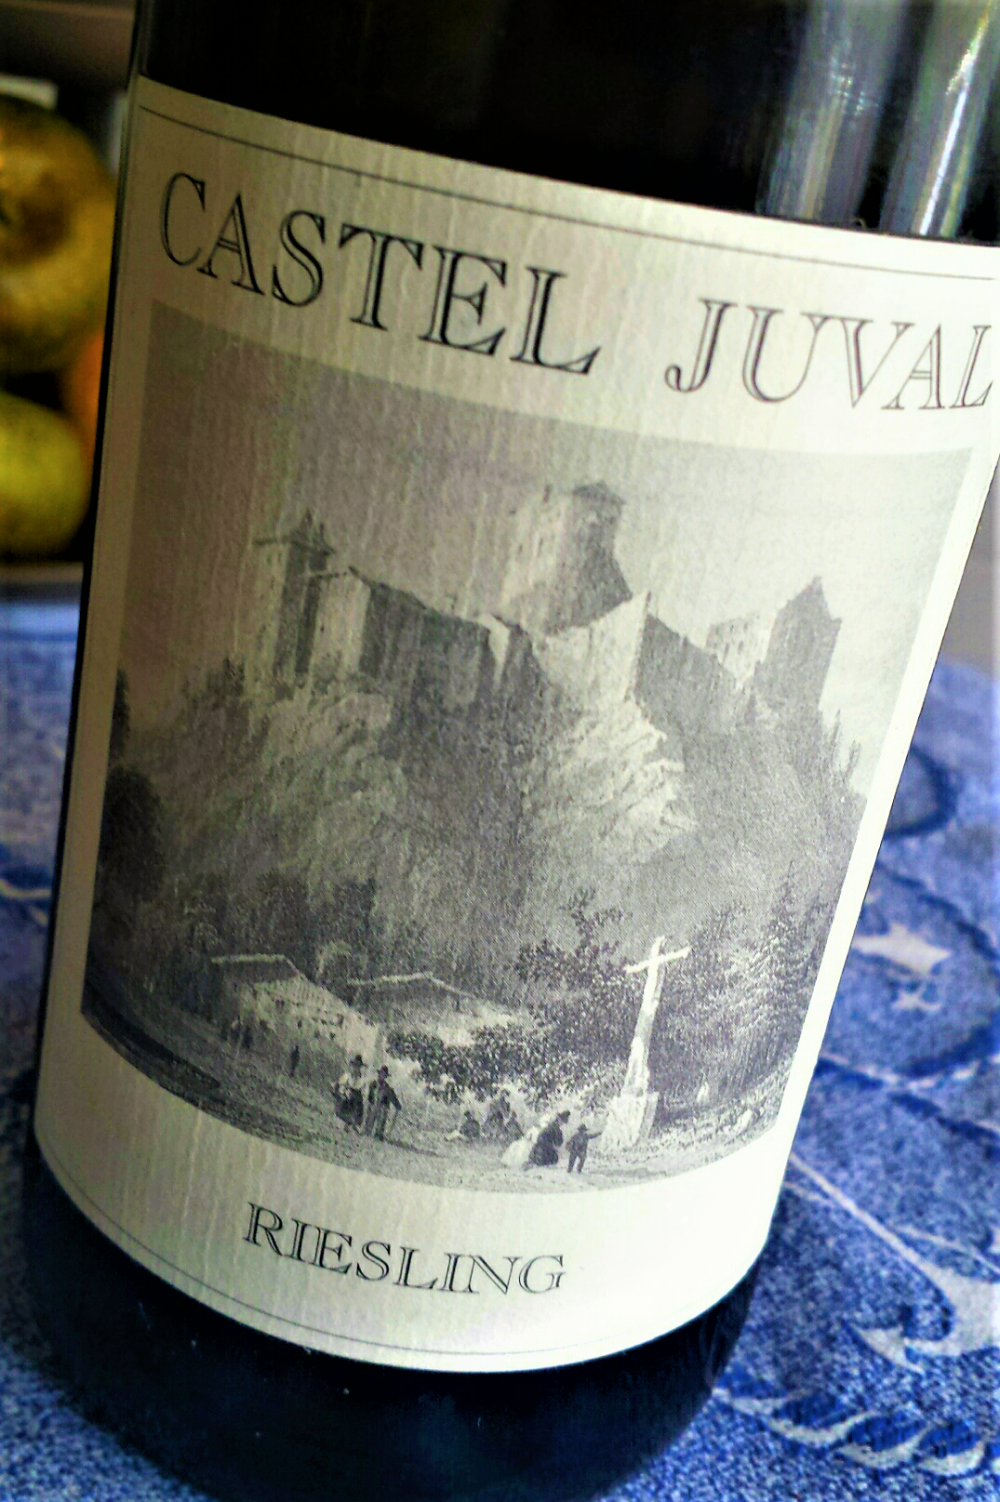 Castel Juval, Riesling